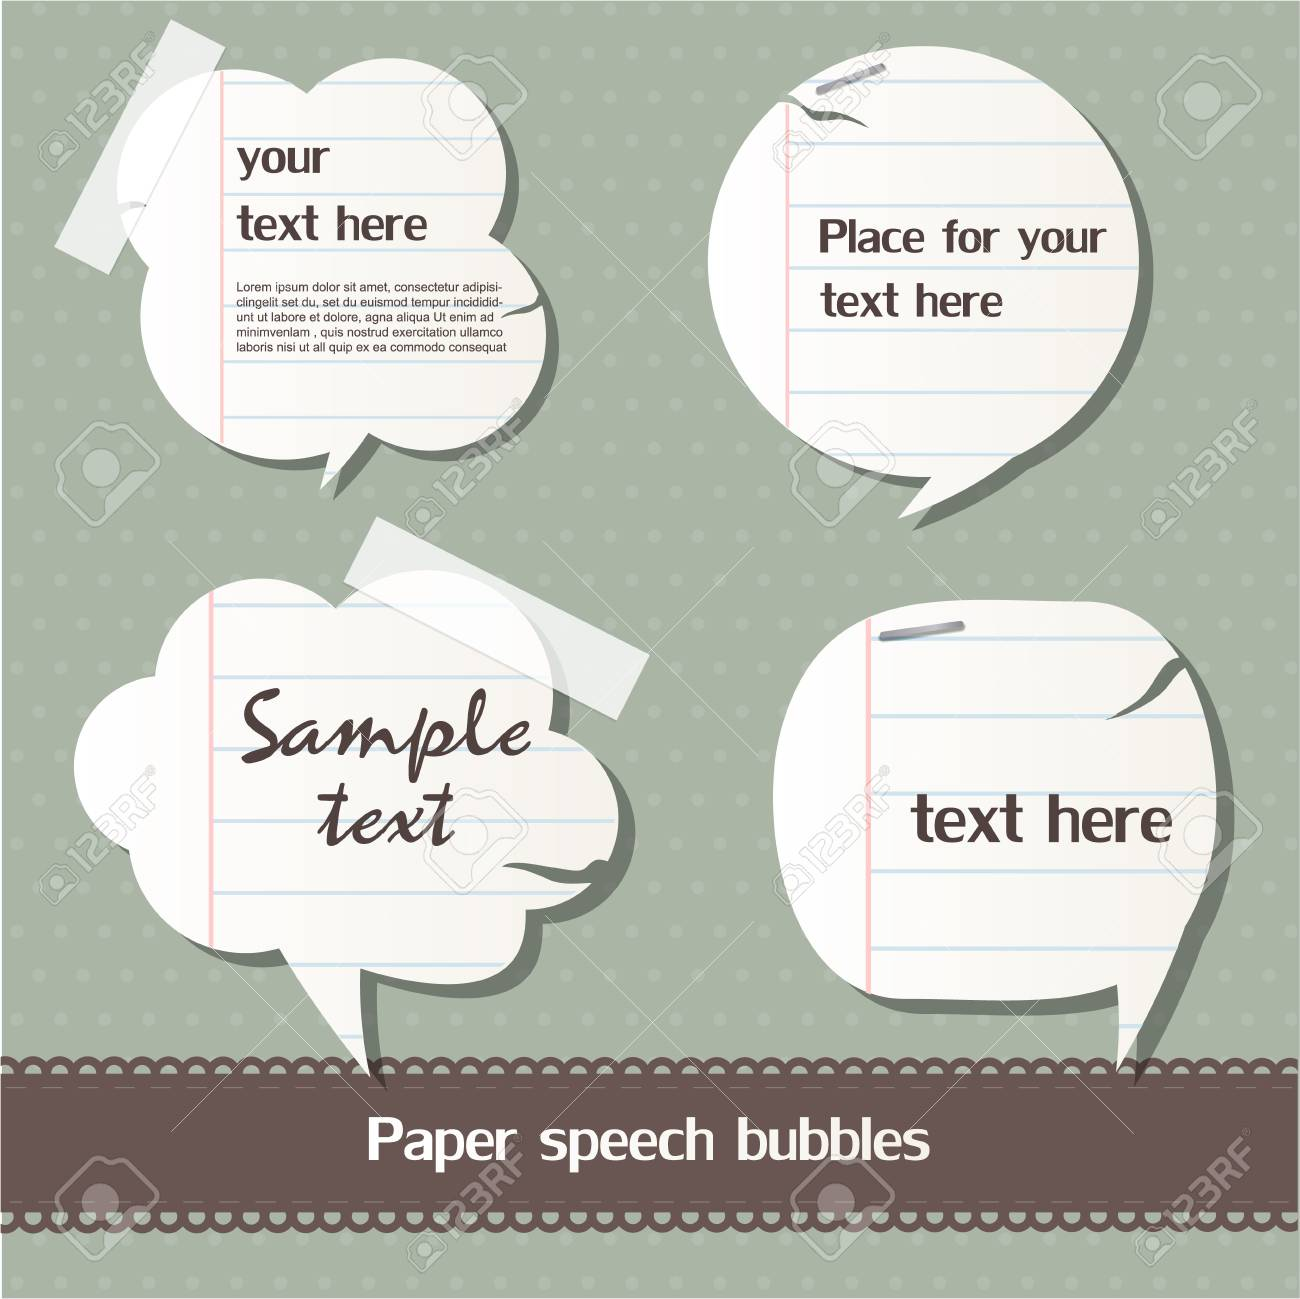 Paper speech bubbles Stock Vector - 12793346